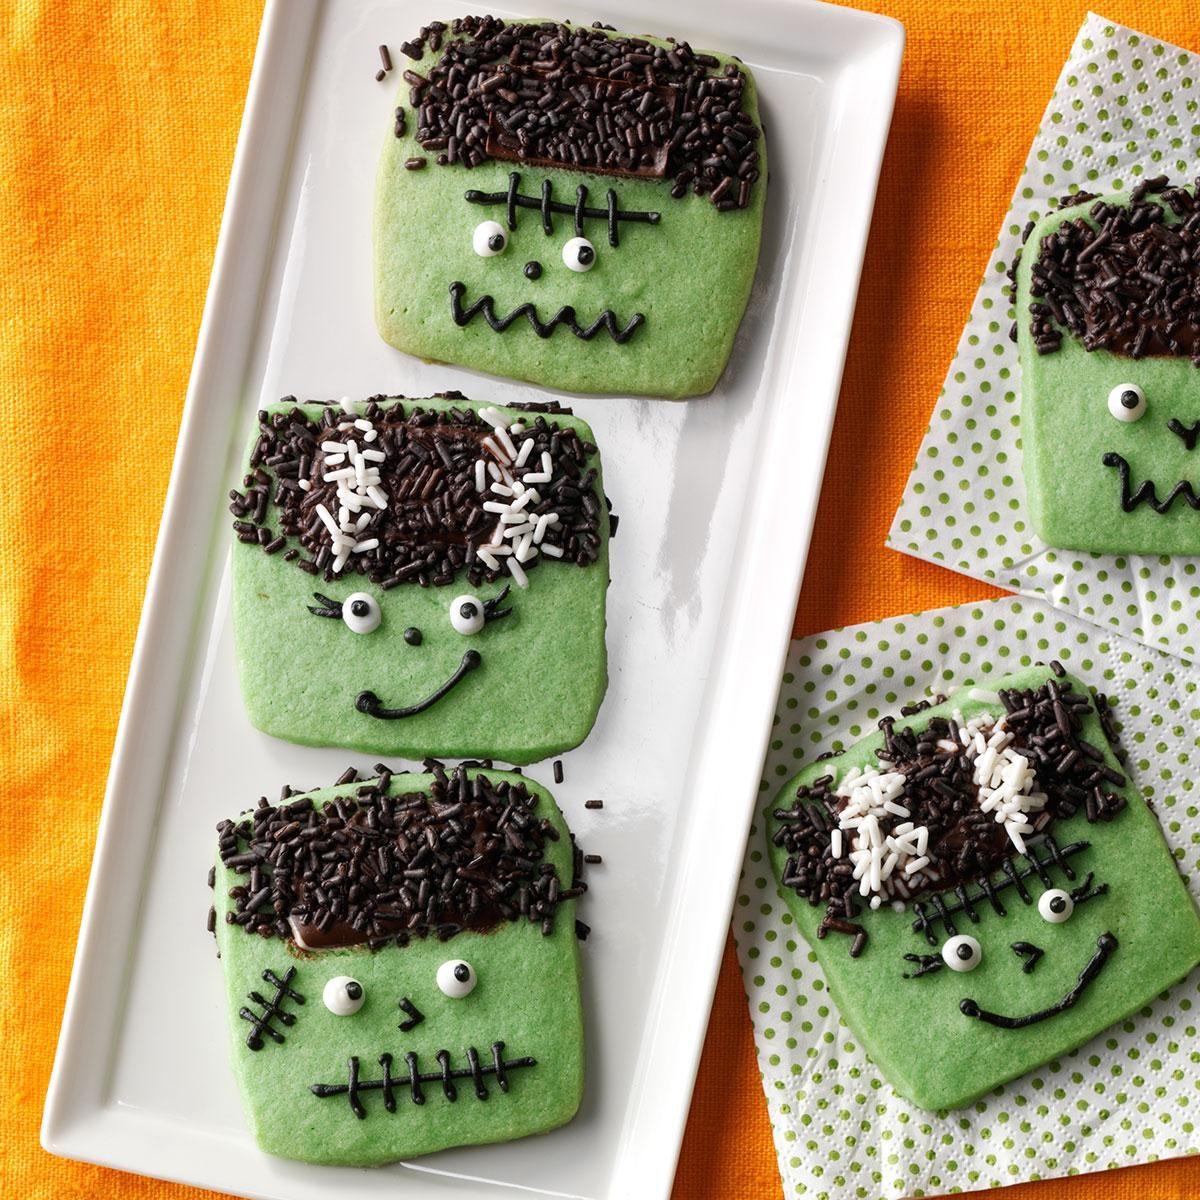 Freaky frankenstein cookies recipe taste of home for Easy halloween treats for work party